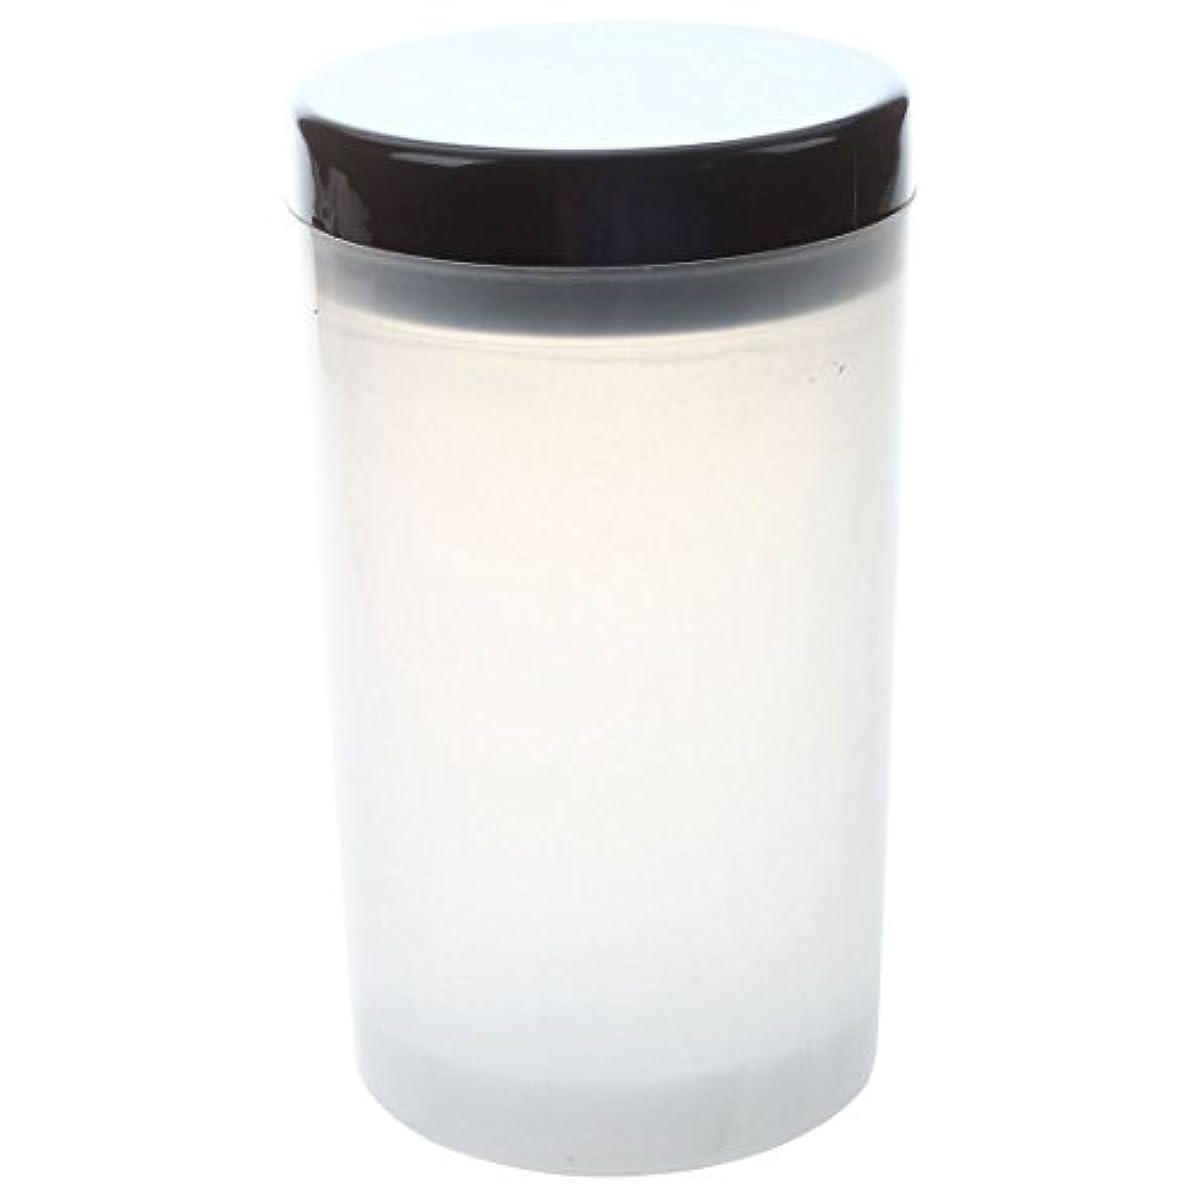 Cikuso ネイルアートチップブラシホルダー リムーバーカップカップ浸漬ブラシ クリーナーボトル